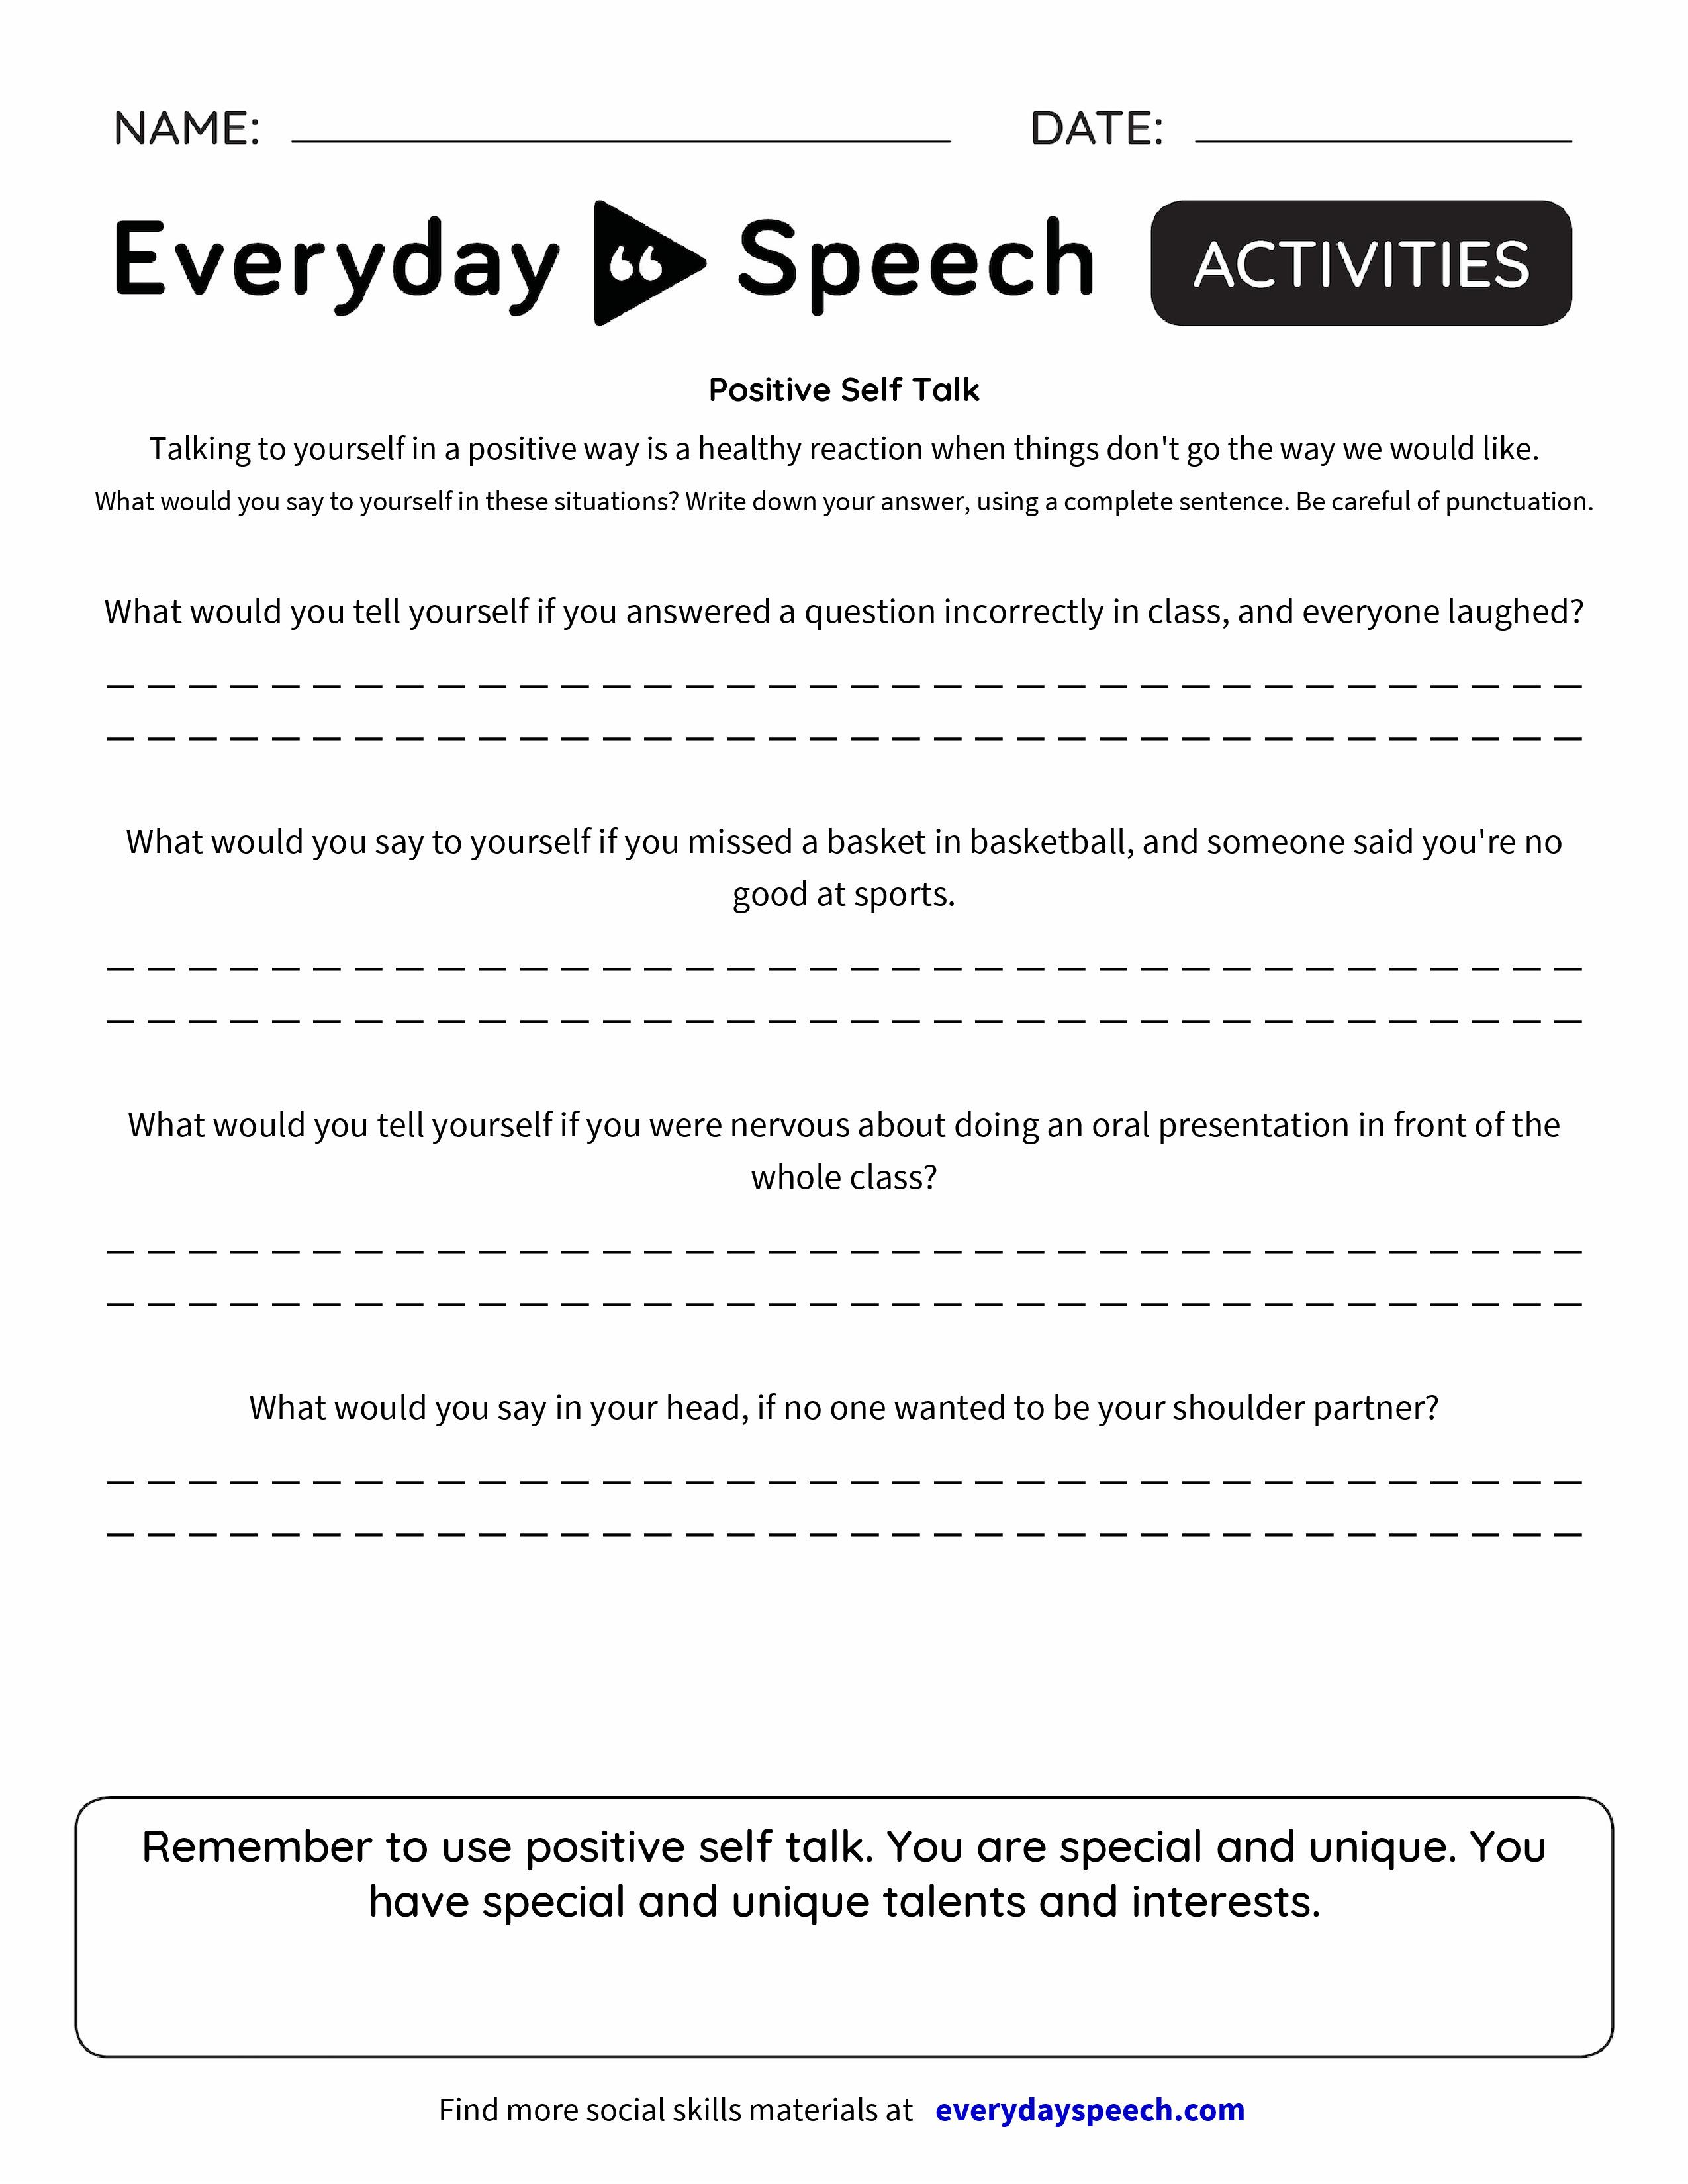 Free Worksheet Irs Publication 915 Worksheet irs publication 915 worksheet 1 laveyla com worksheet